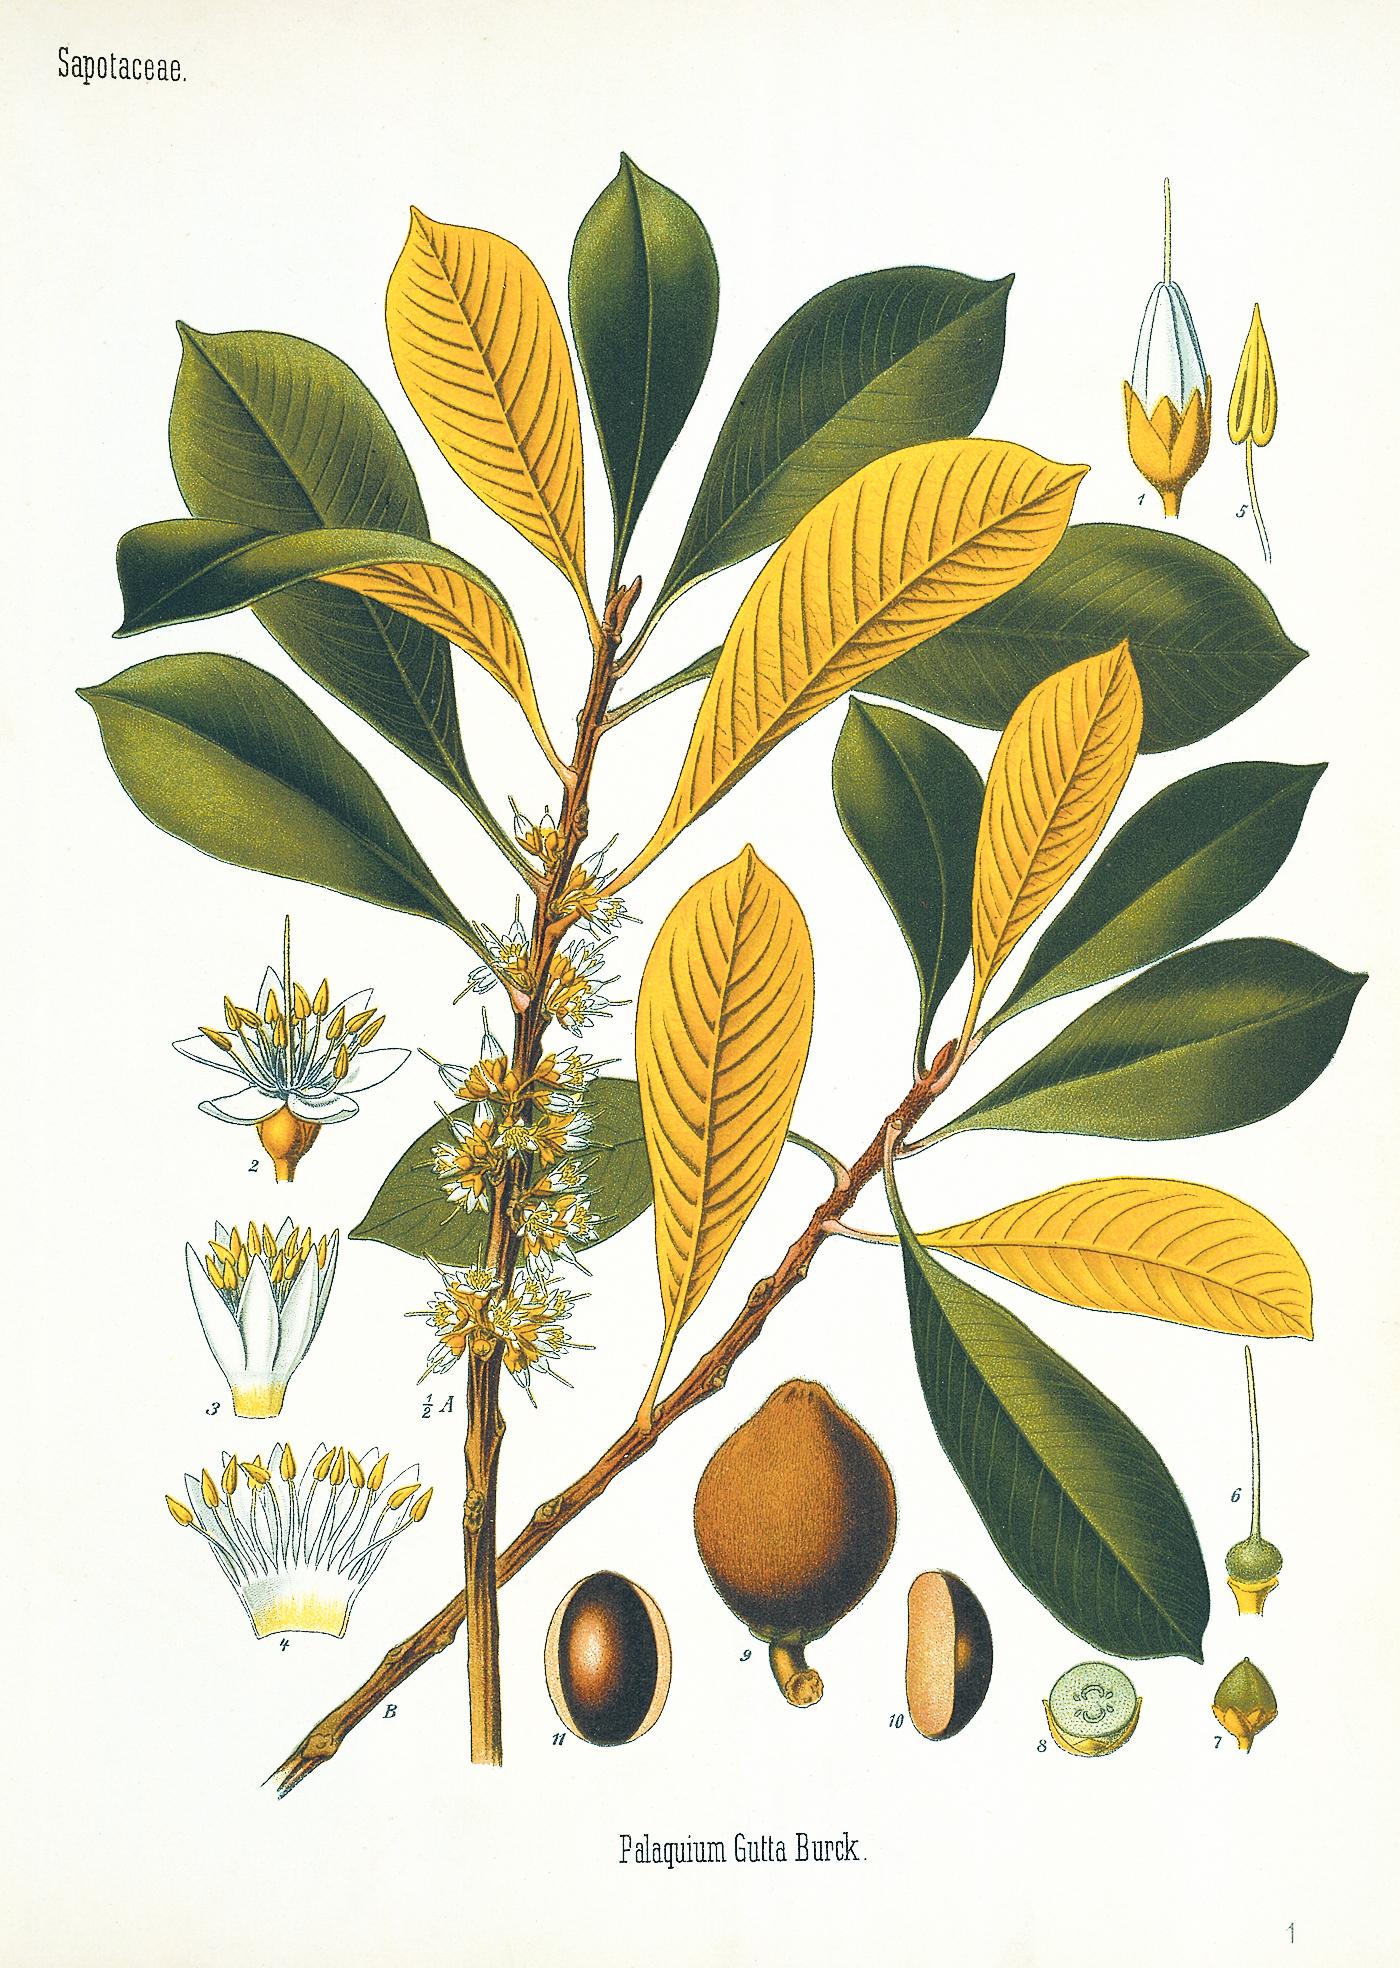 A color illustration of the gutta-percha tree.